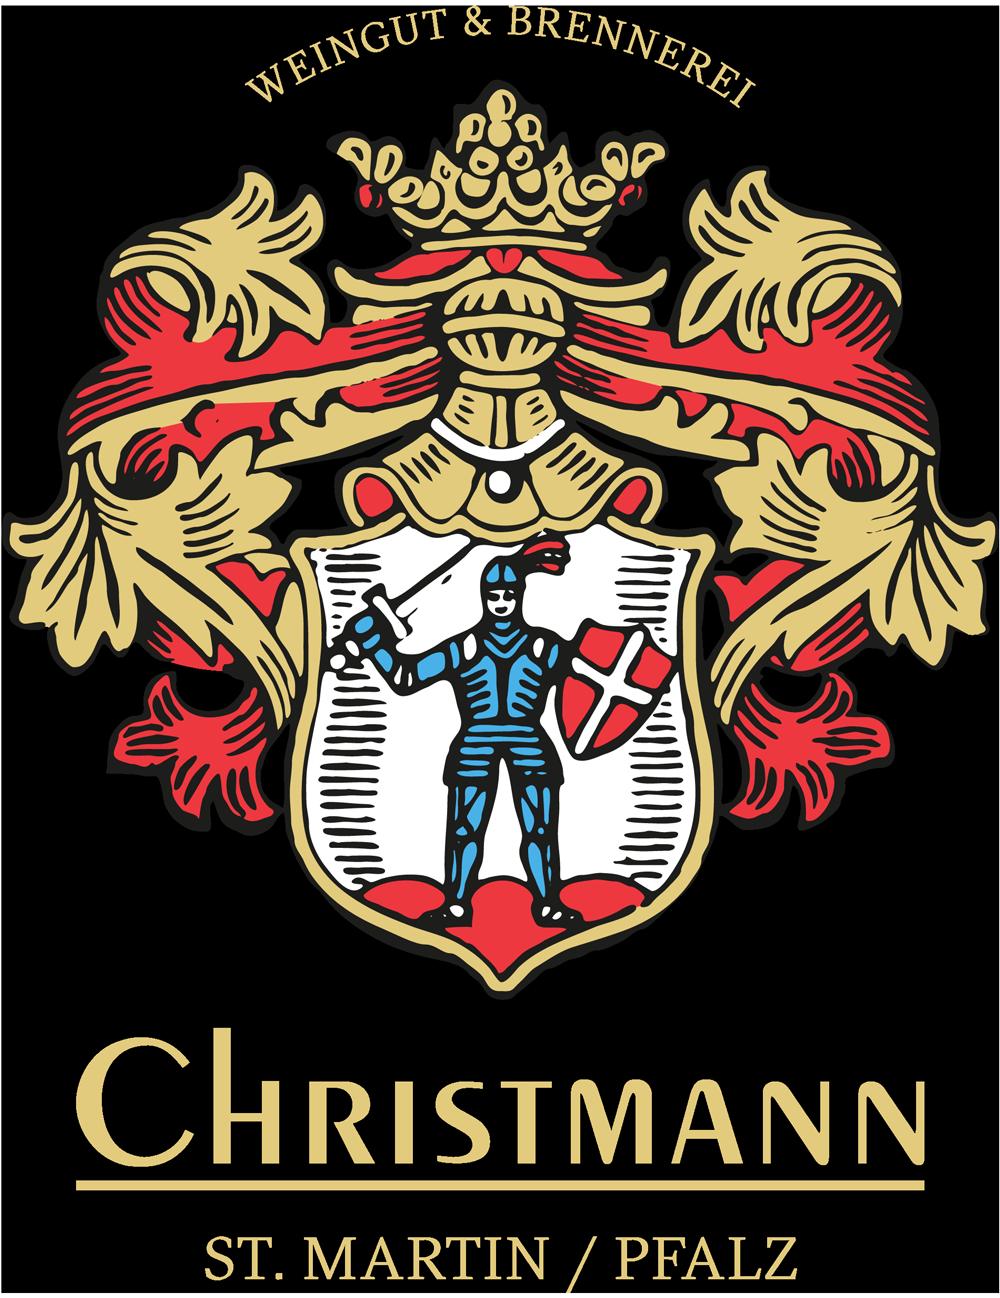 Weingut & Brennerei Christmann